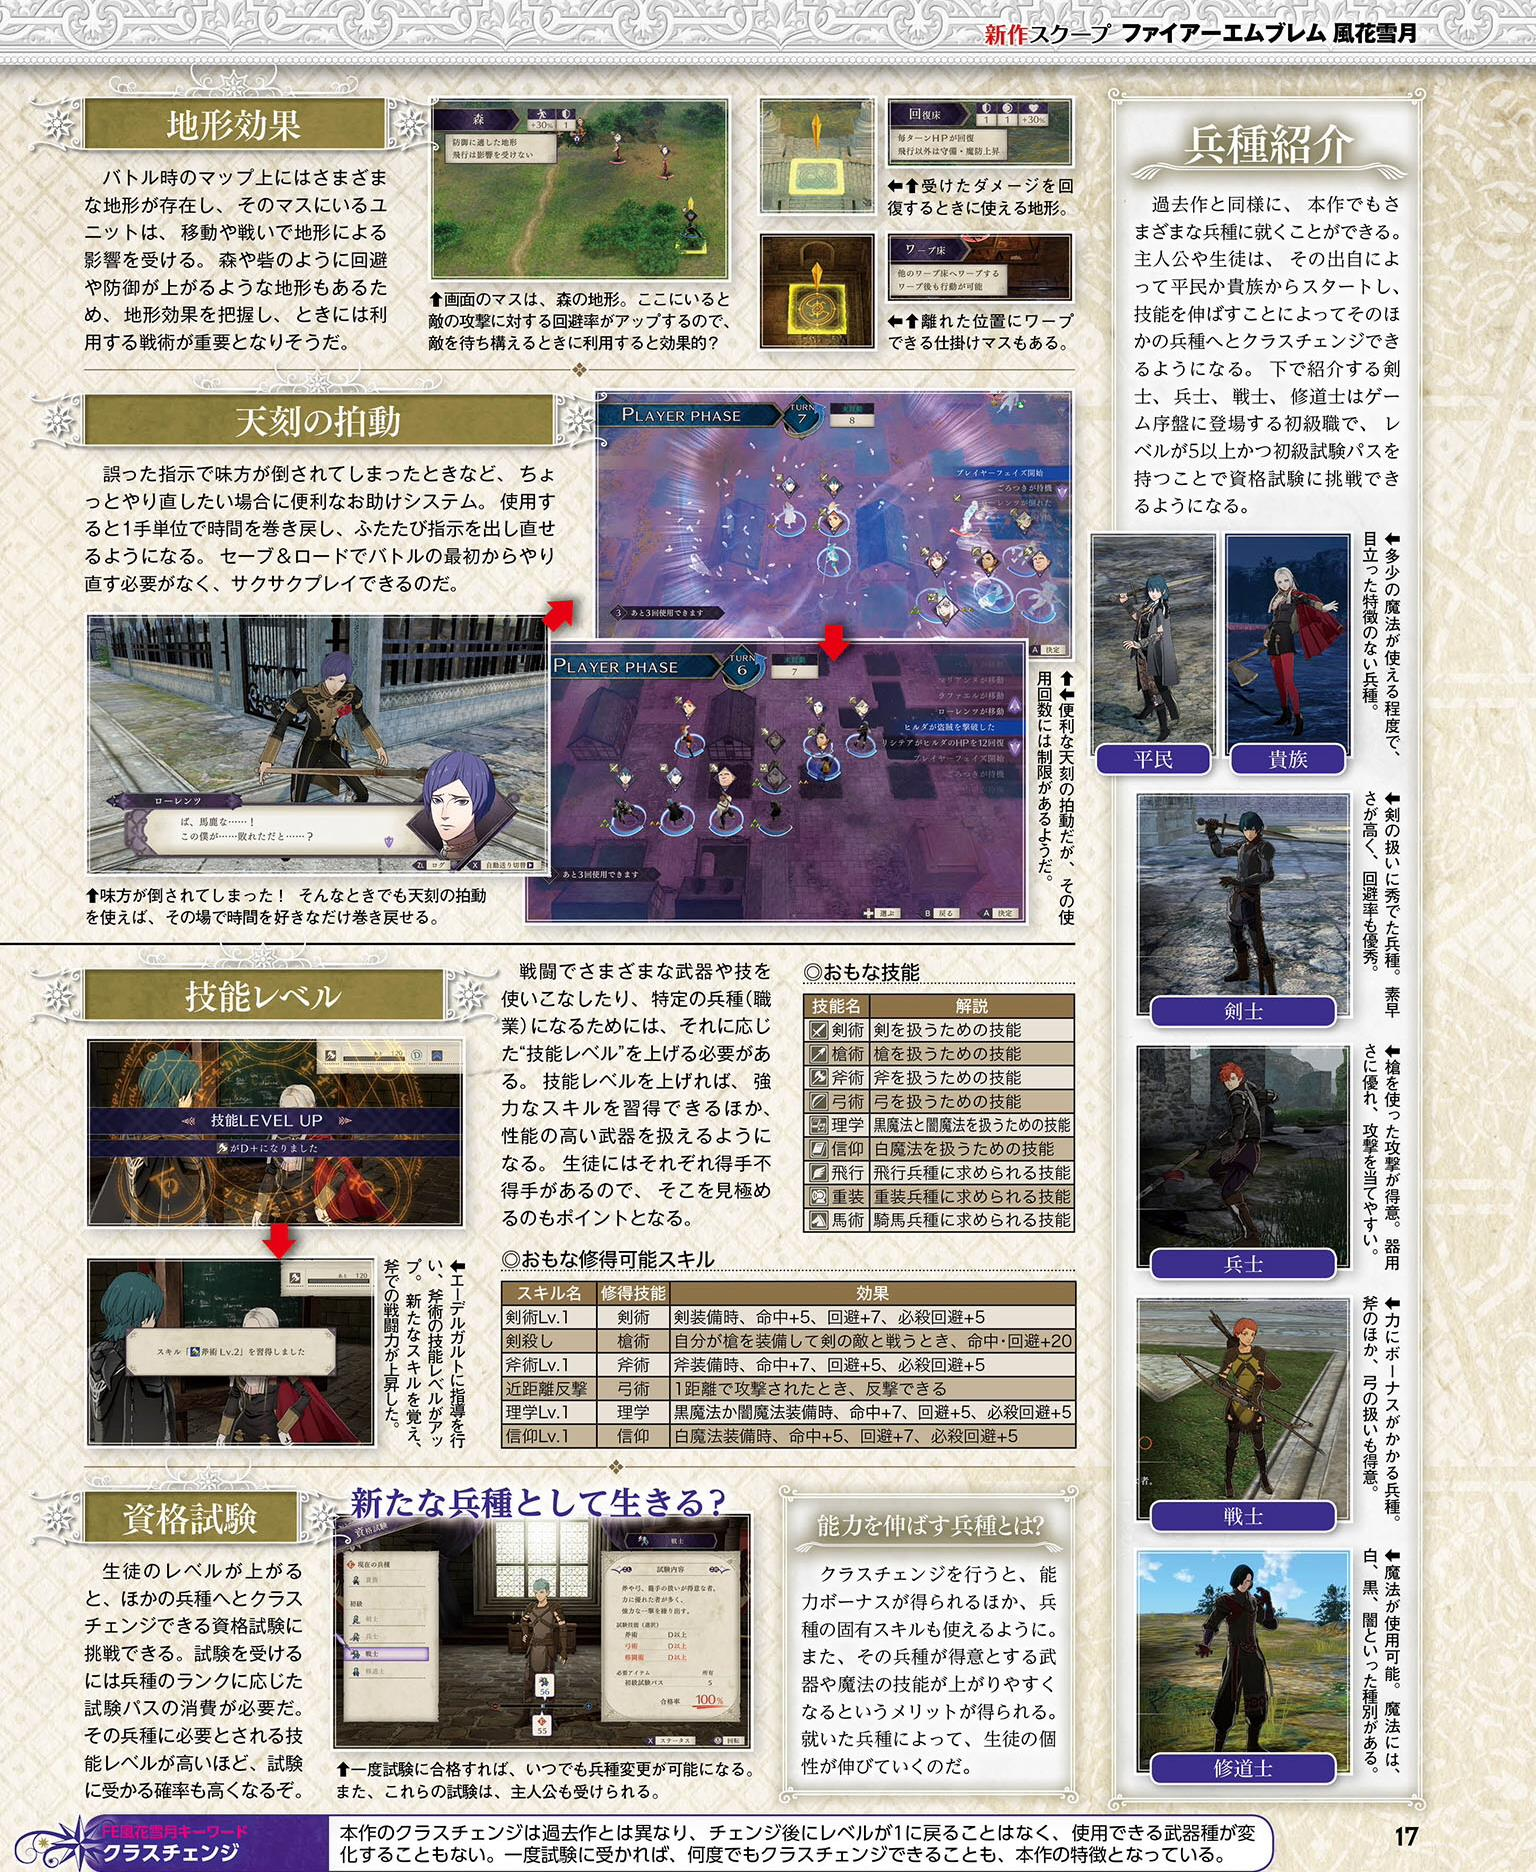 Fire Emblem: Three Houses - Famitsu Scan 6